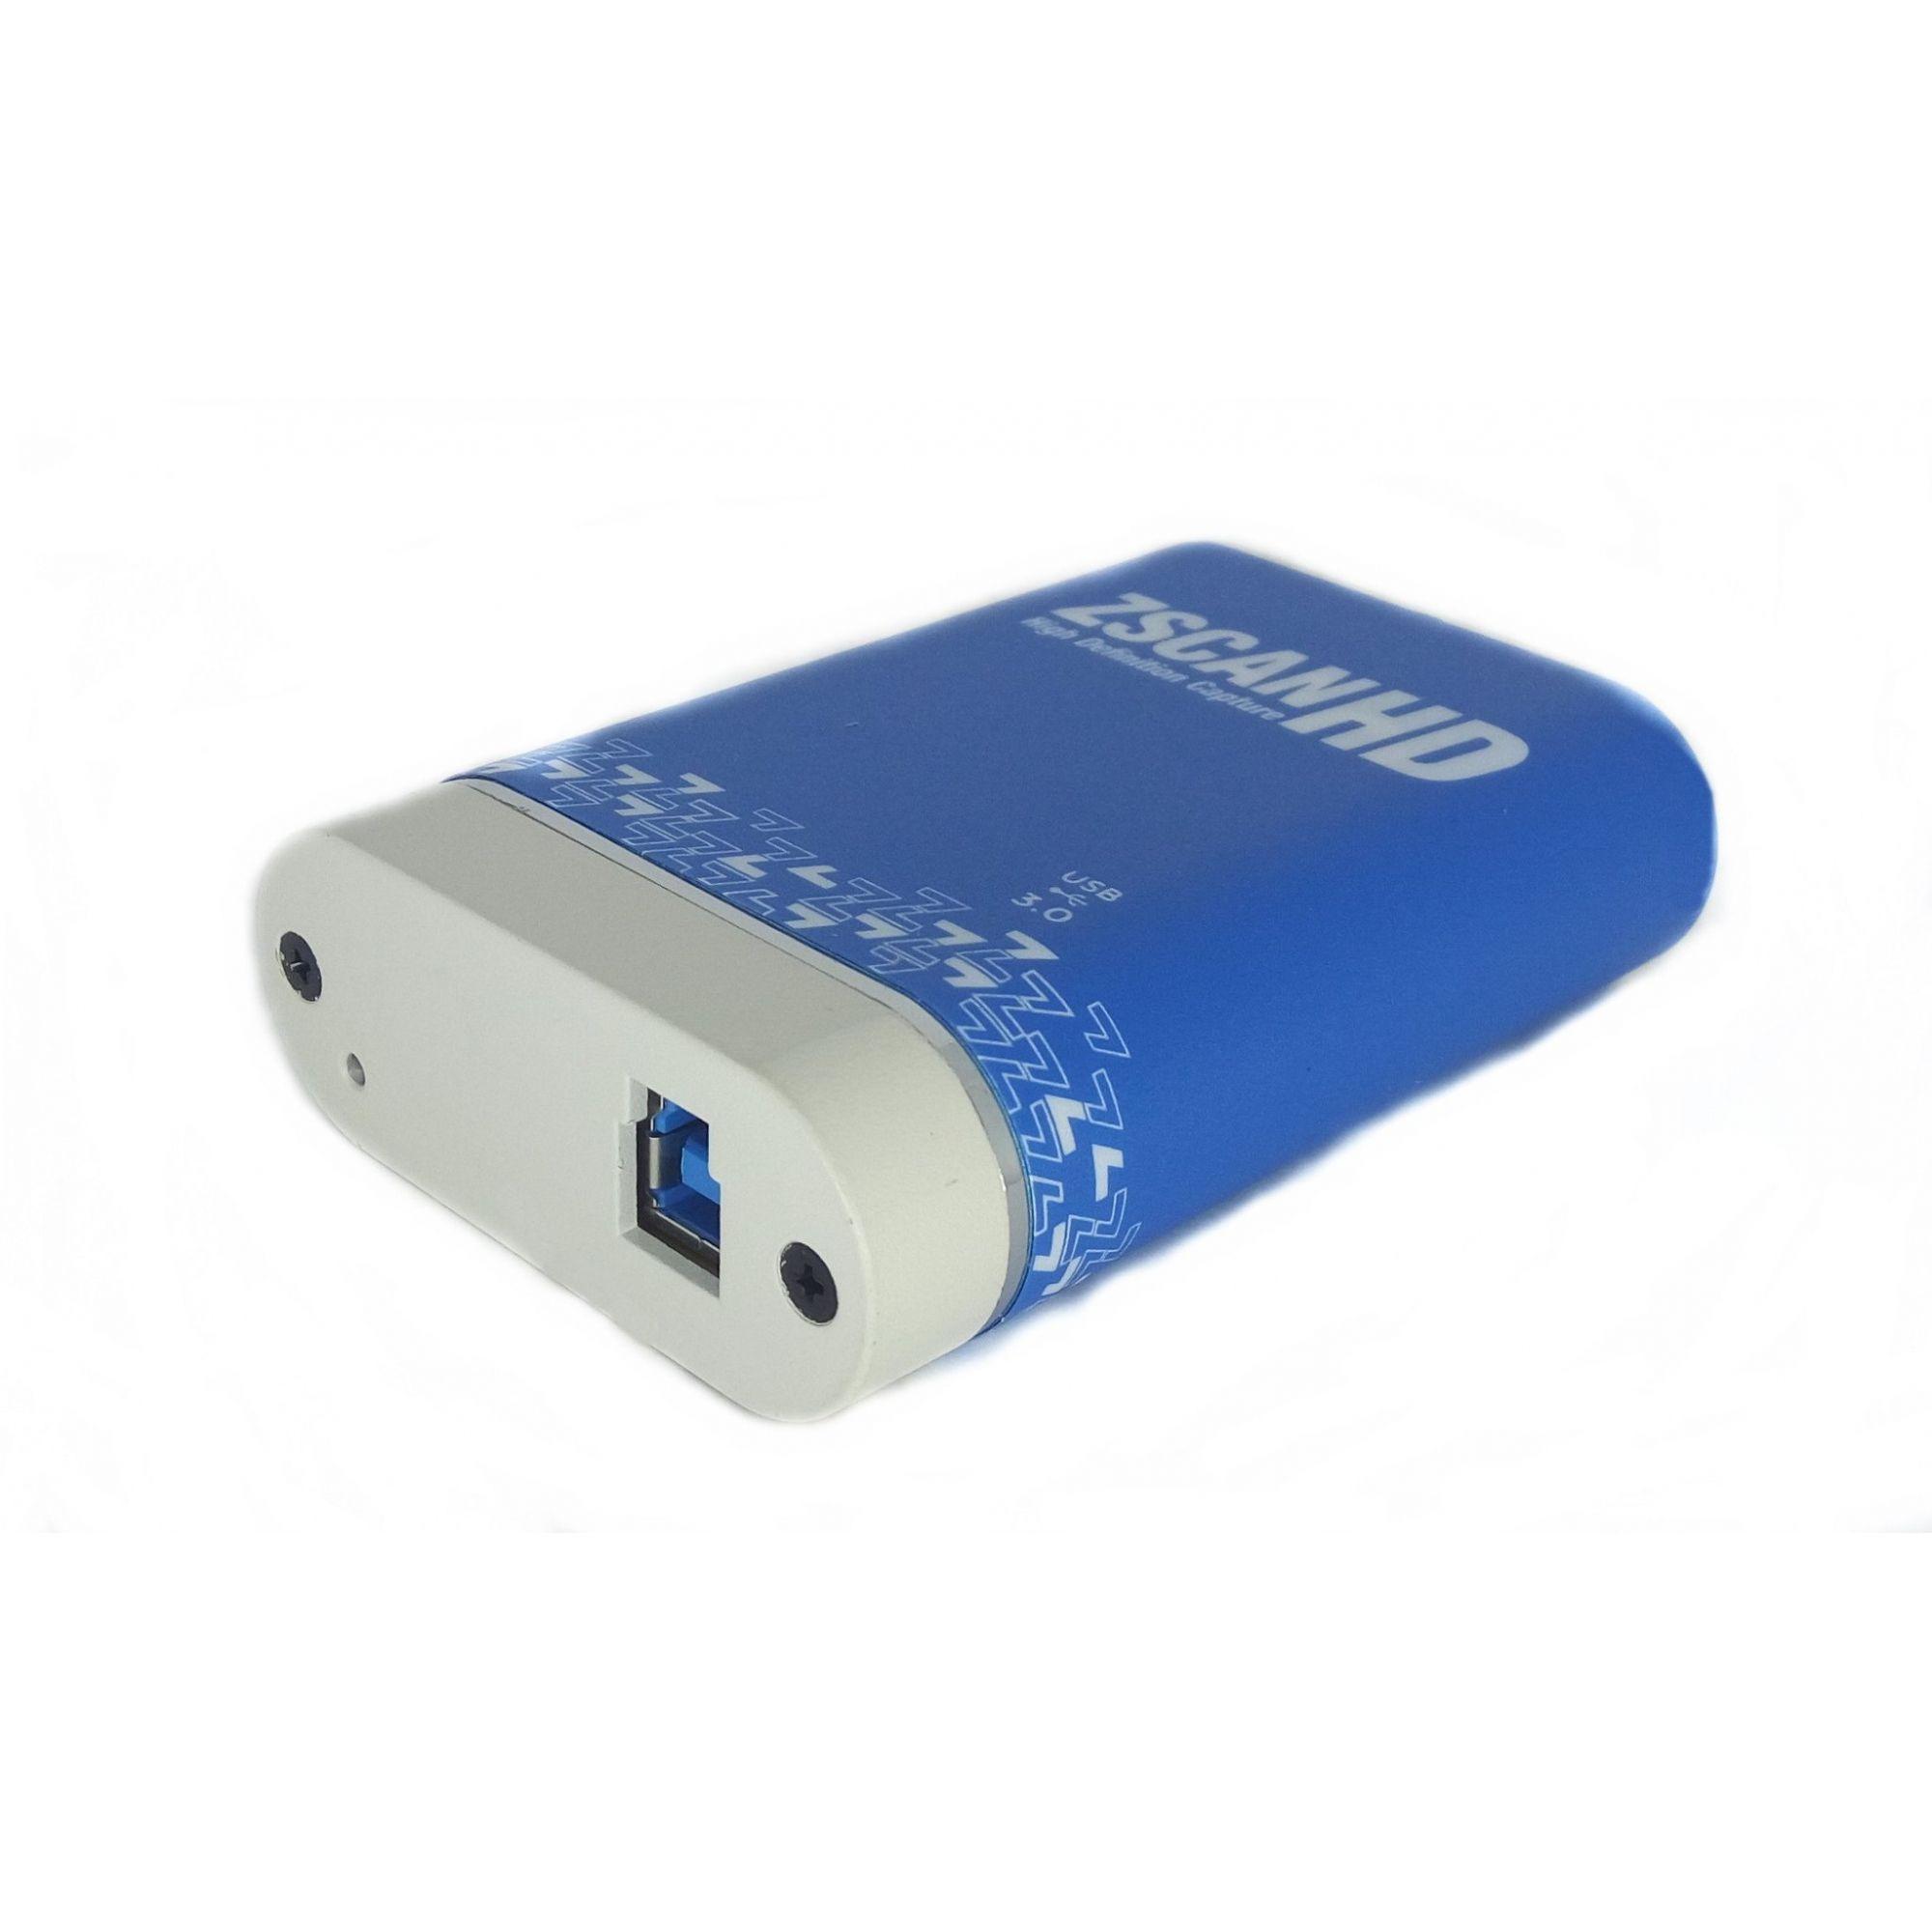 Placa de Captura Digital DVI-USB 3.0